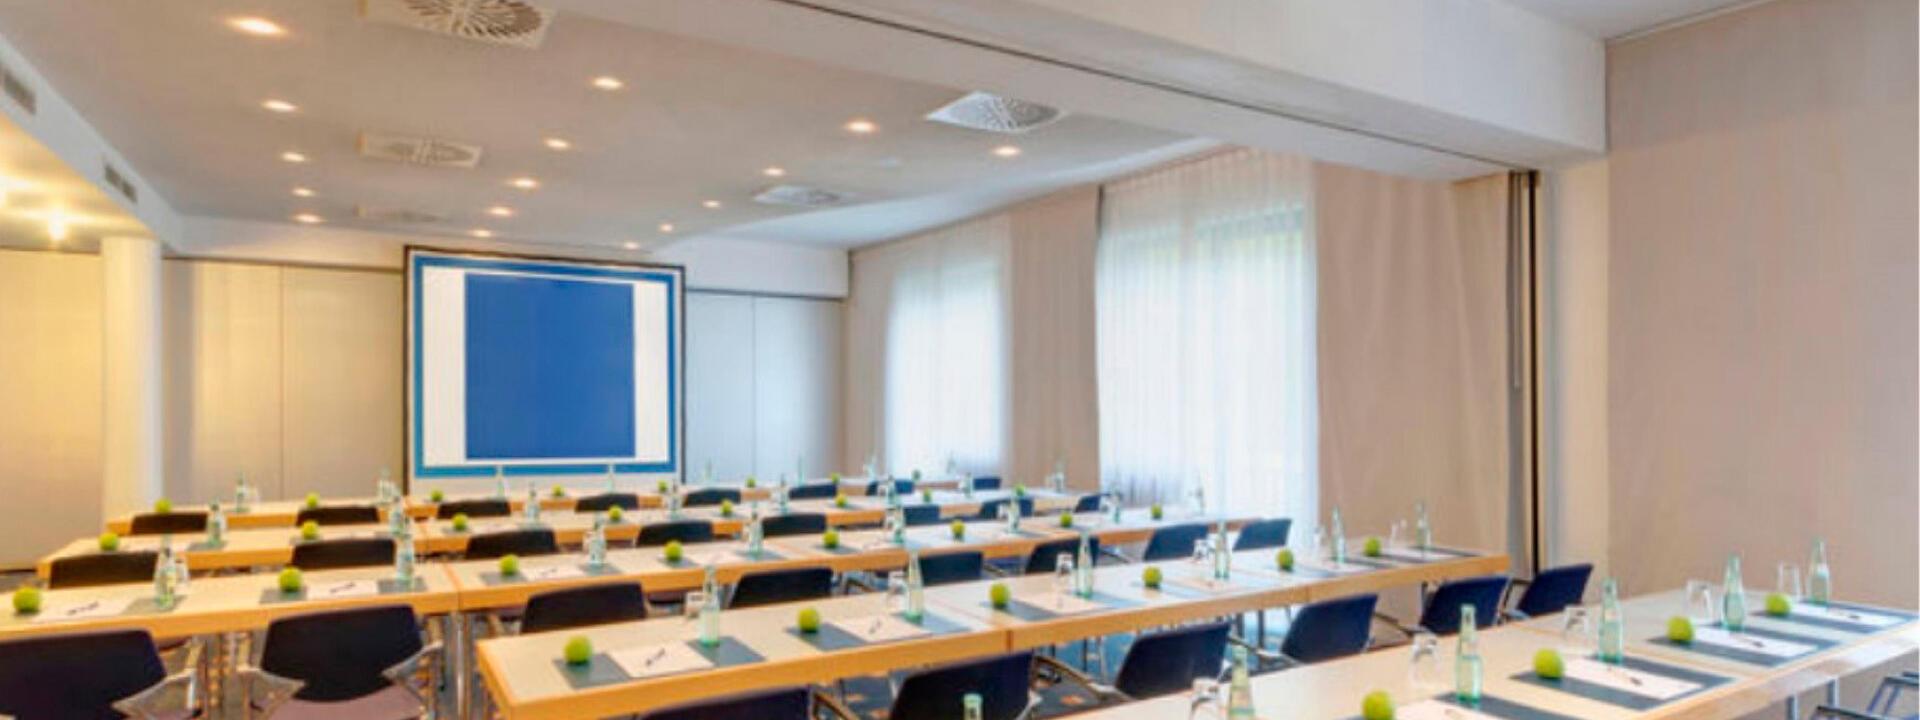 Meeting rooms at Precise House Düsseldorf Airport